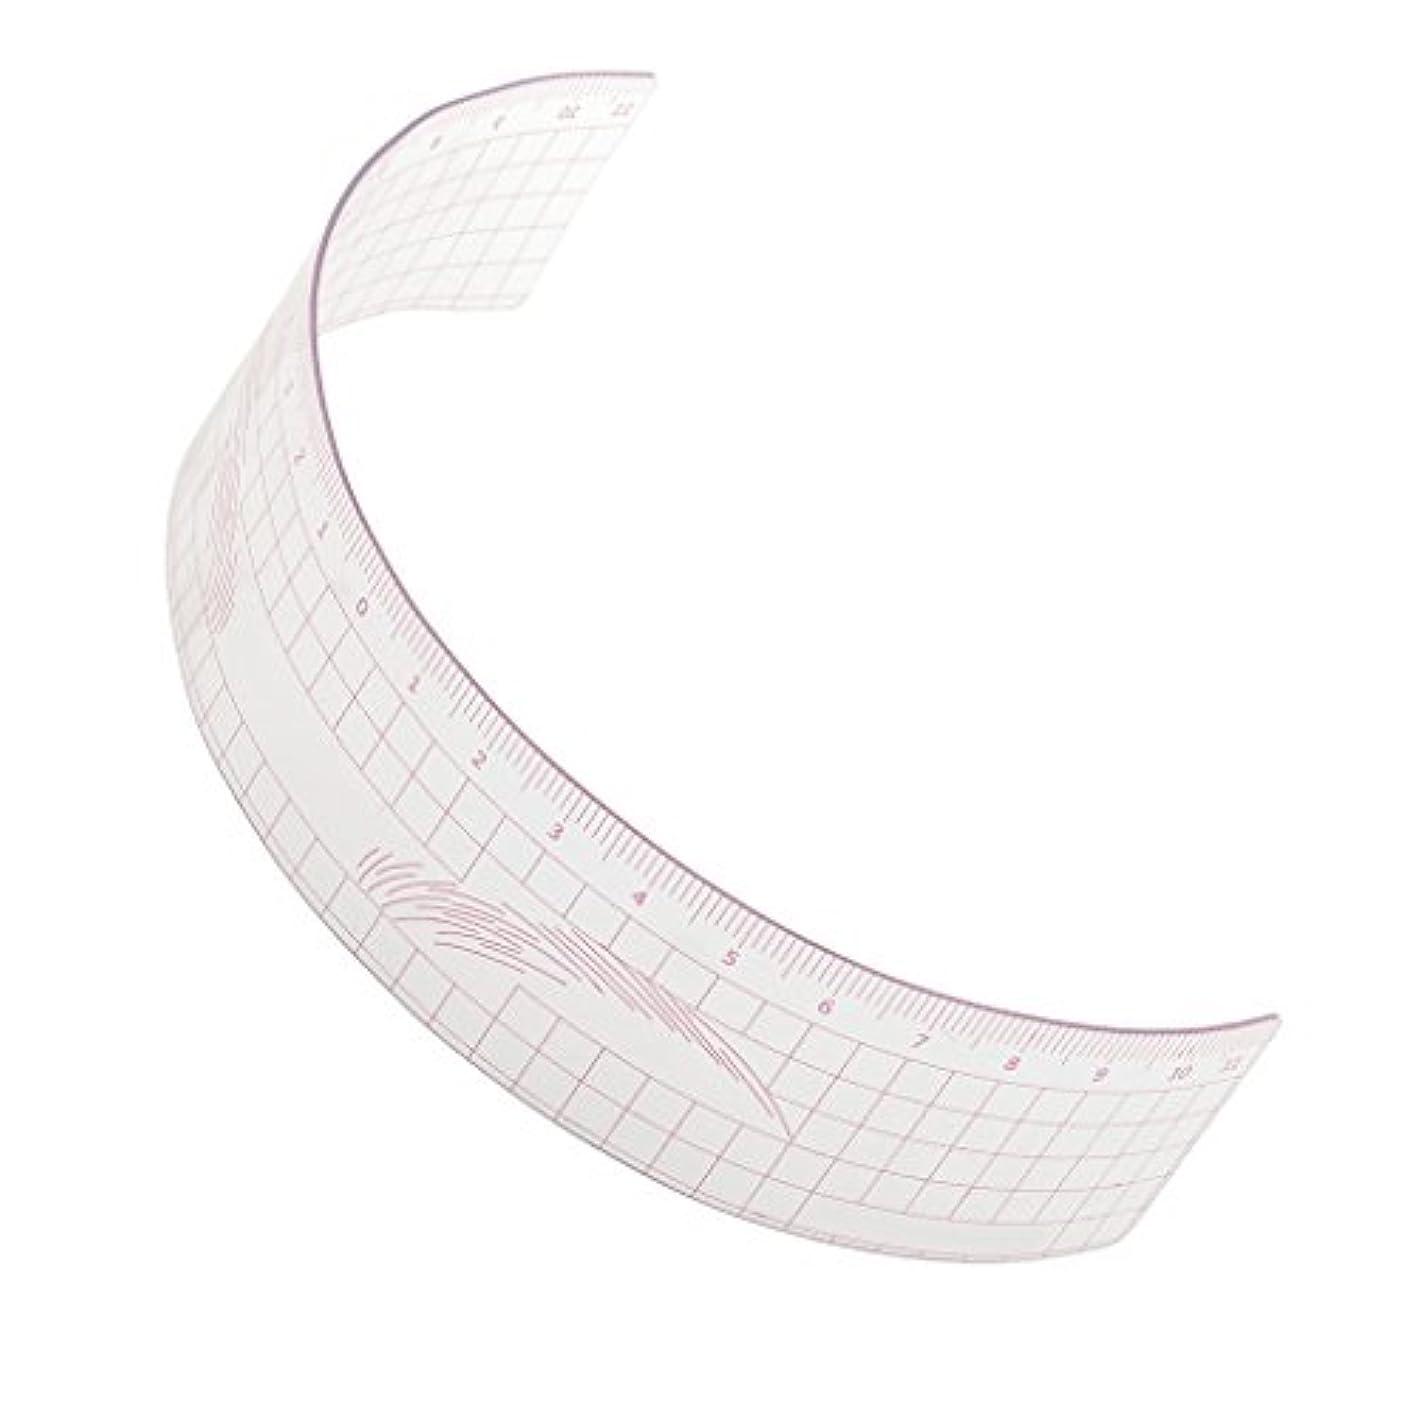 Perfk 再利用可能 メイク 眉毛ステンシル マイクロブレード 測定用 ルーラー ツール 全3色 - ピンク